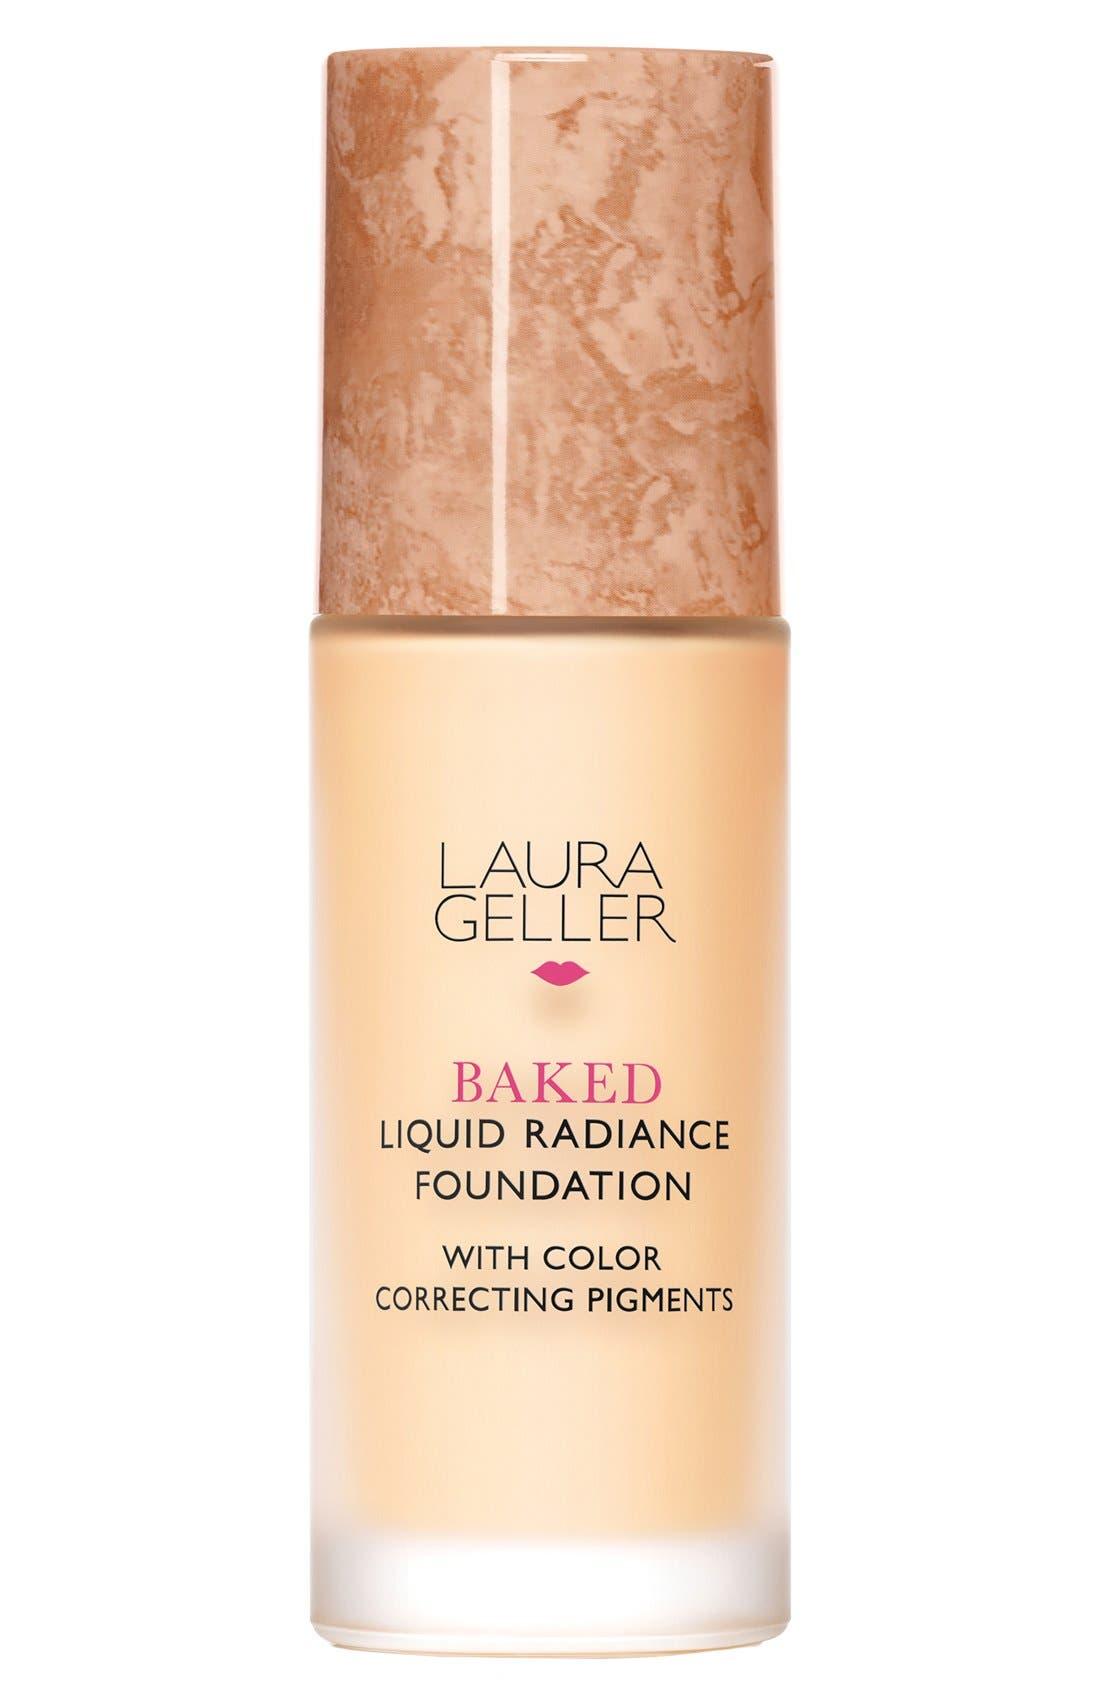 'Baked' Liquid Radiance Foundation,                             Main thumbnail 1, color,                             250